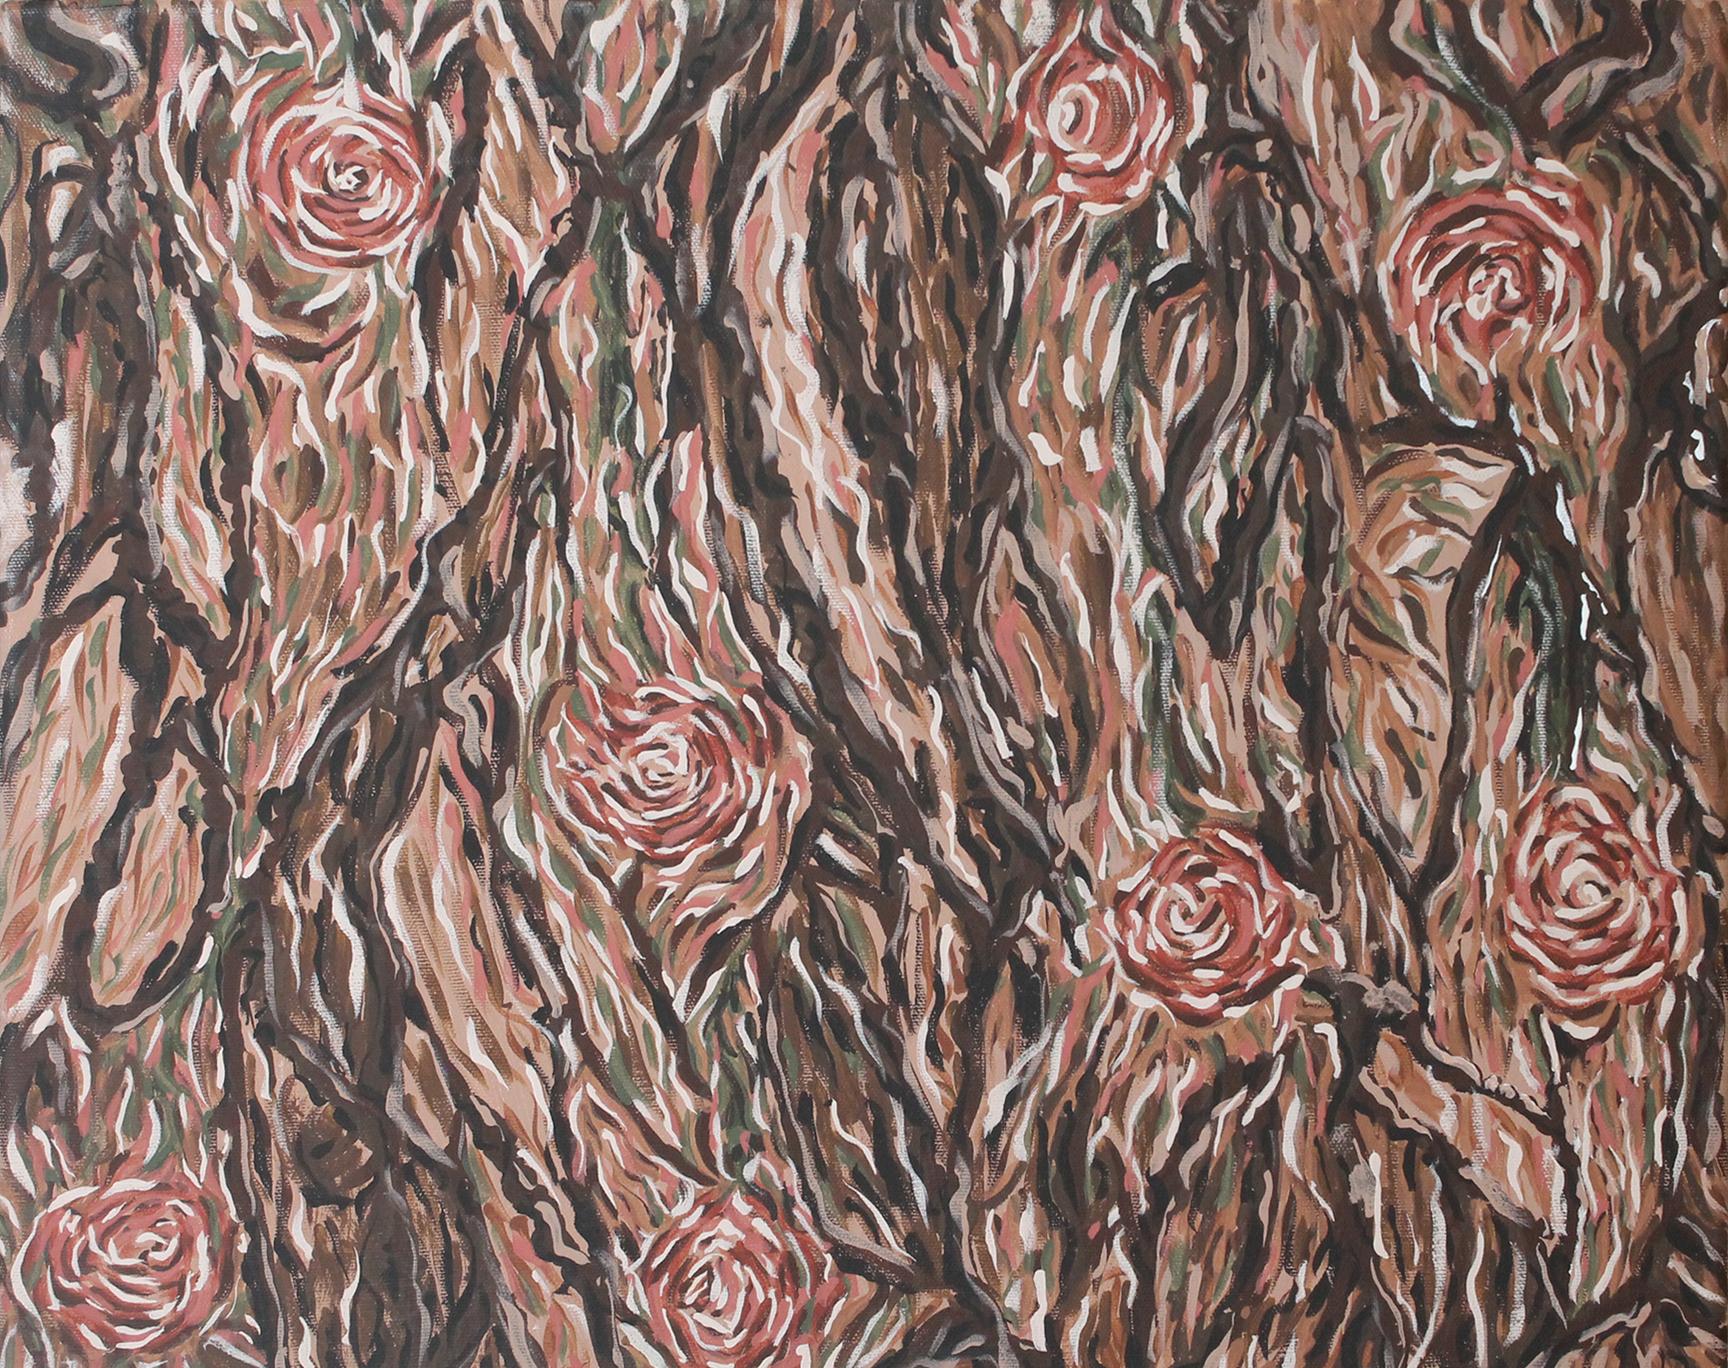 Abstraction of Bark - Acrylic